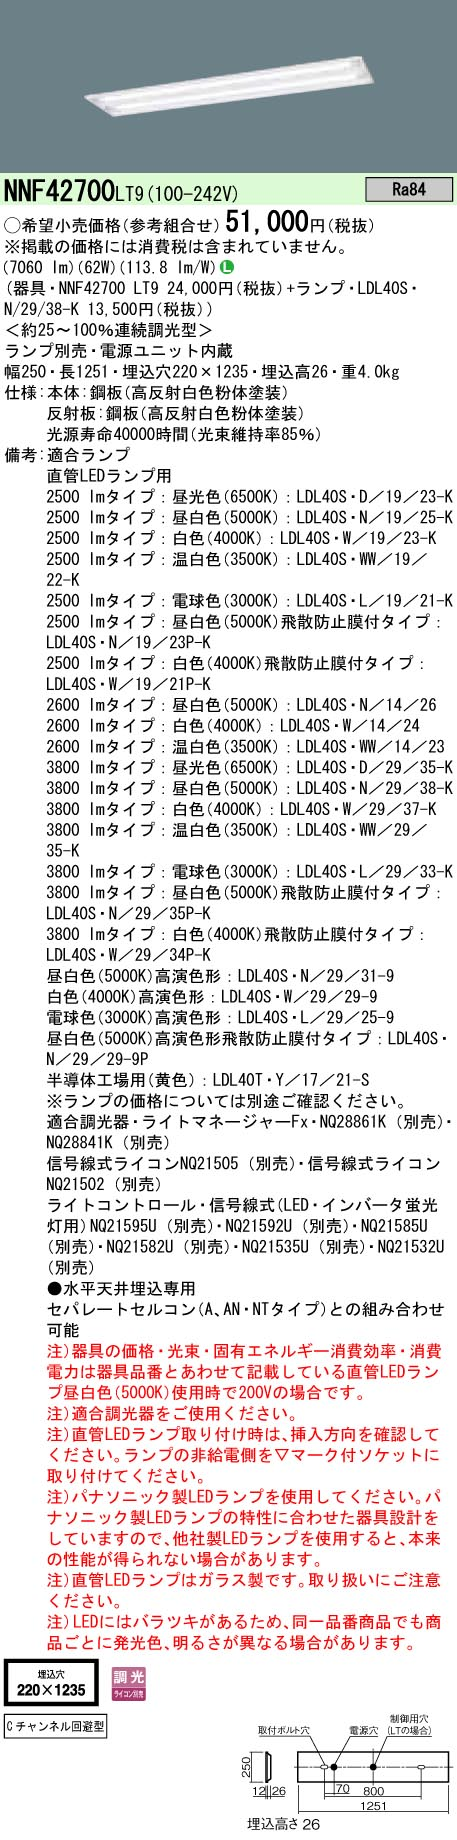 NNF42700LT9+LDL40S N 29 38-K×2 パナソニック 送料無料 新品 ●日本正規品● 埋込LEDベースライト 62W 昼白色 3800lmタイプ 調光型